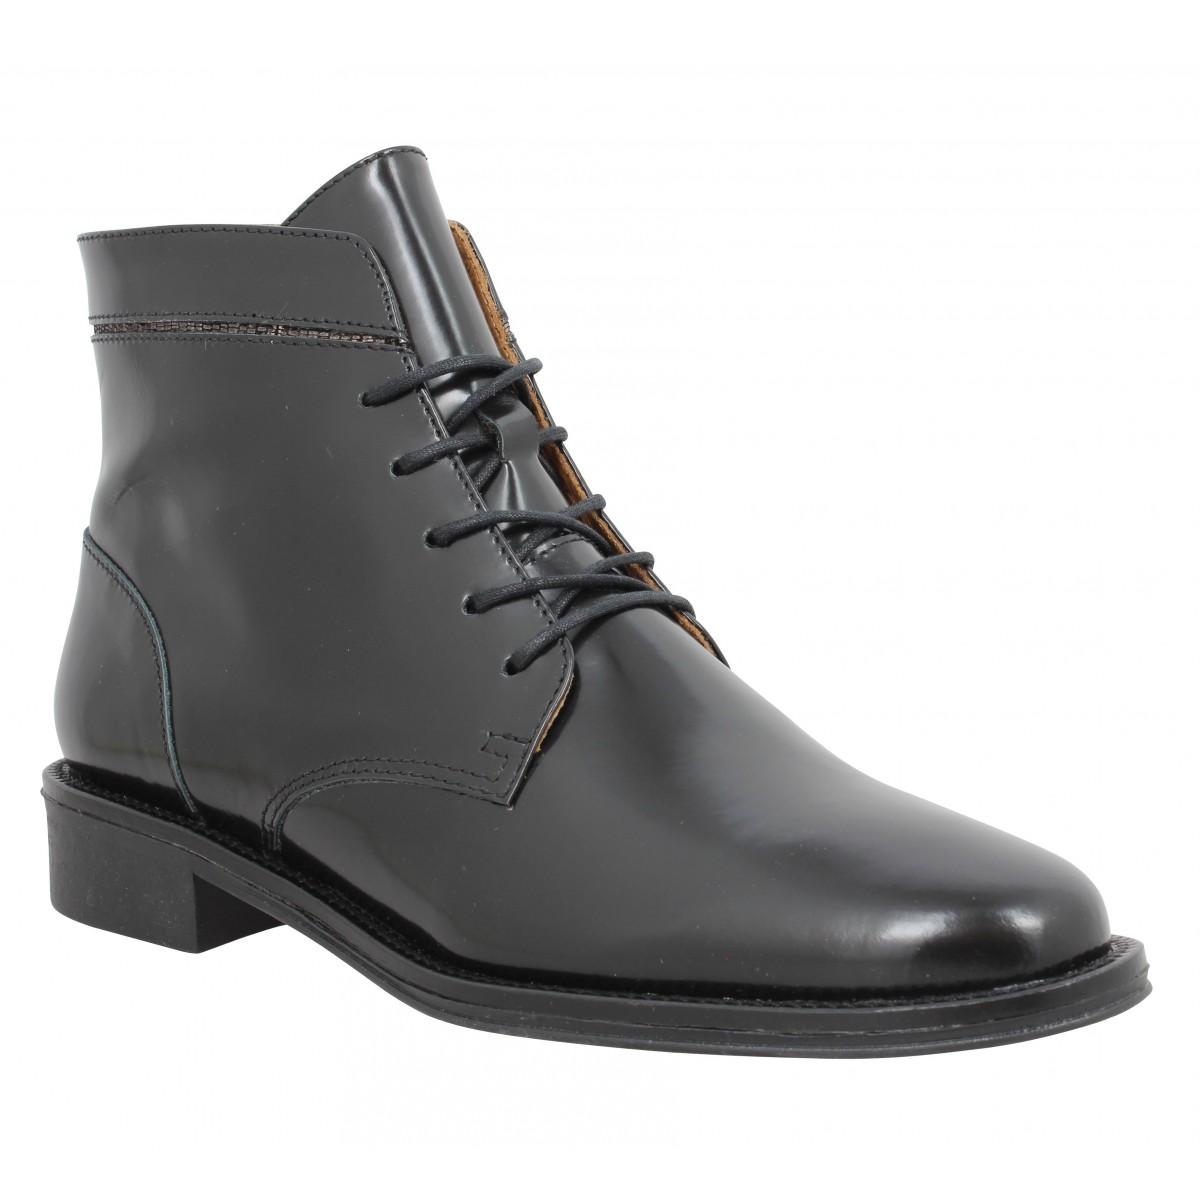 bead7f83a525 Bottines SCHMOOVE Newton Boots cuir Femme Noir